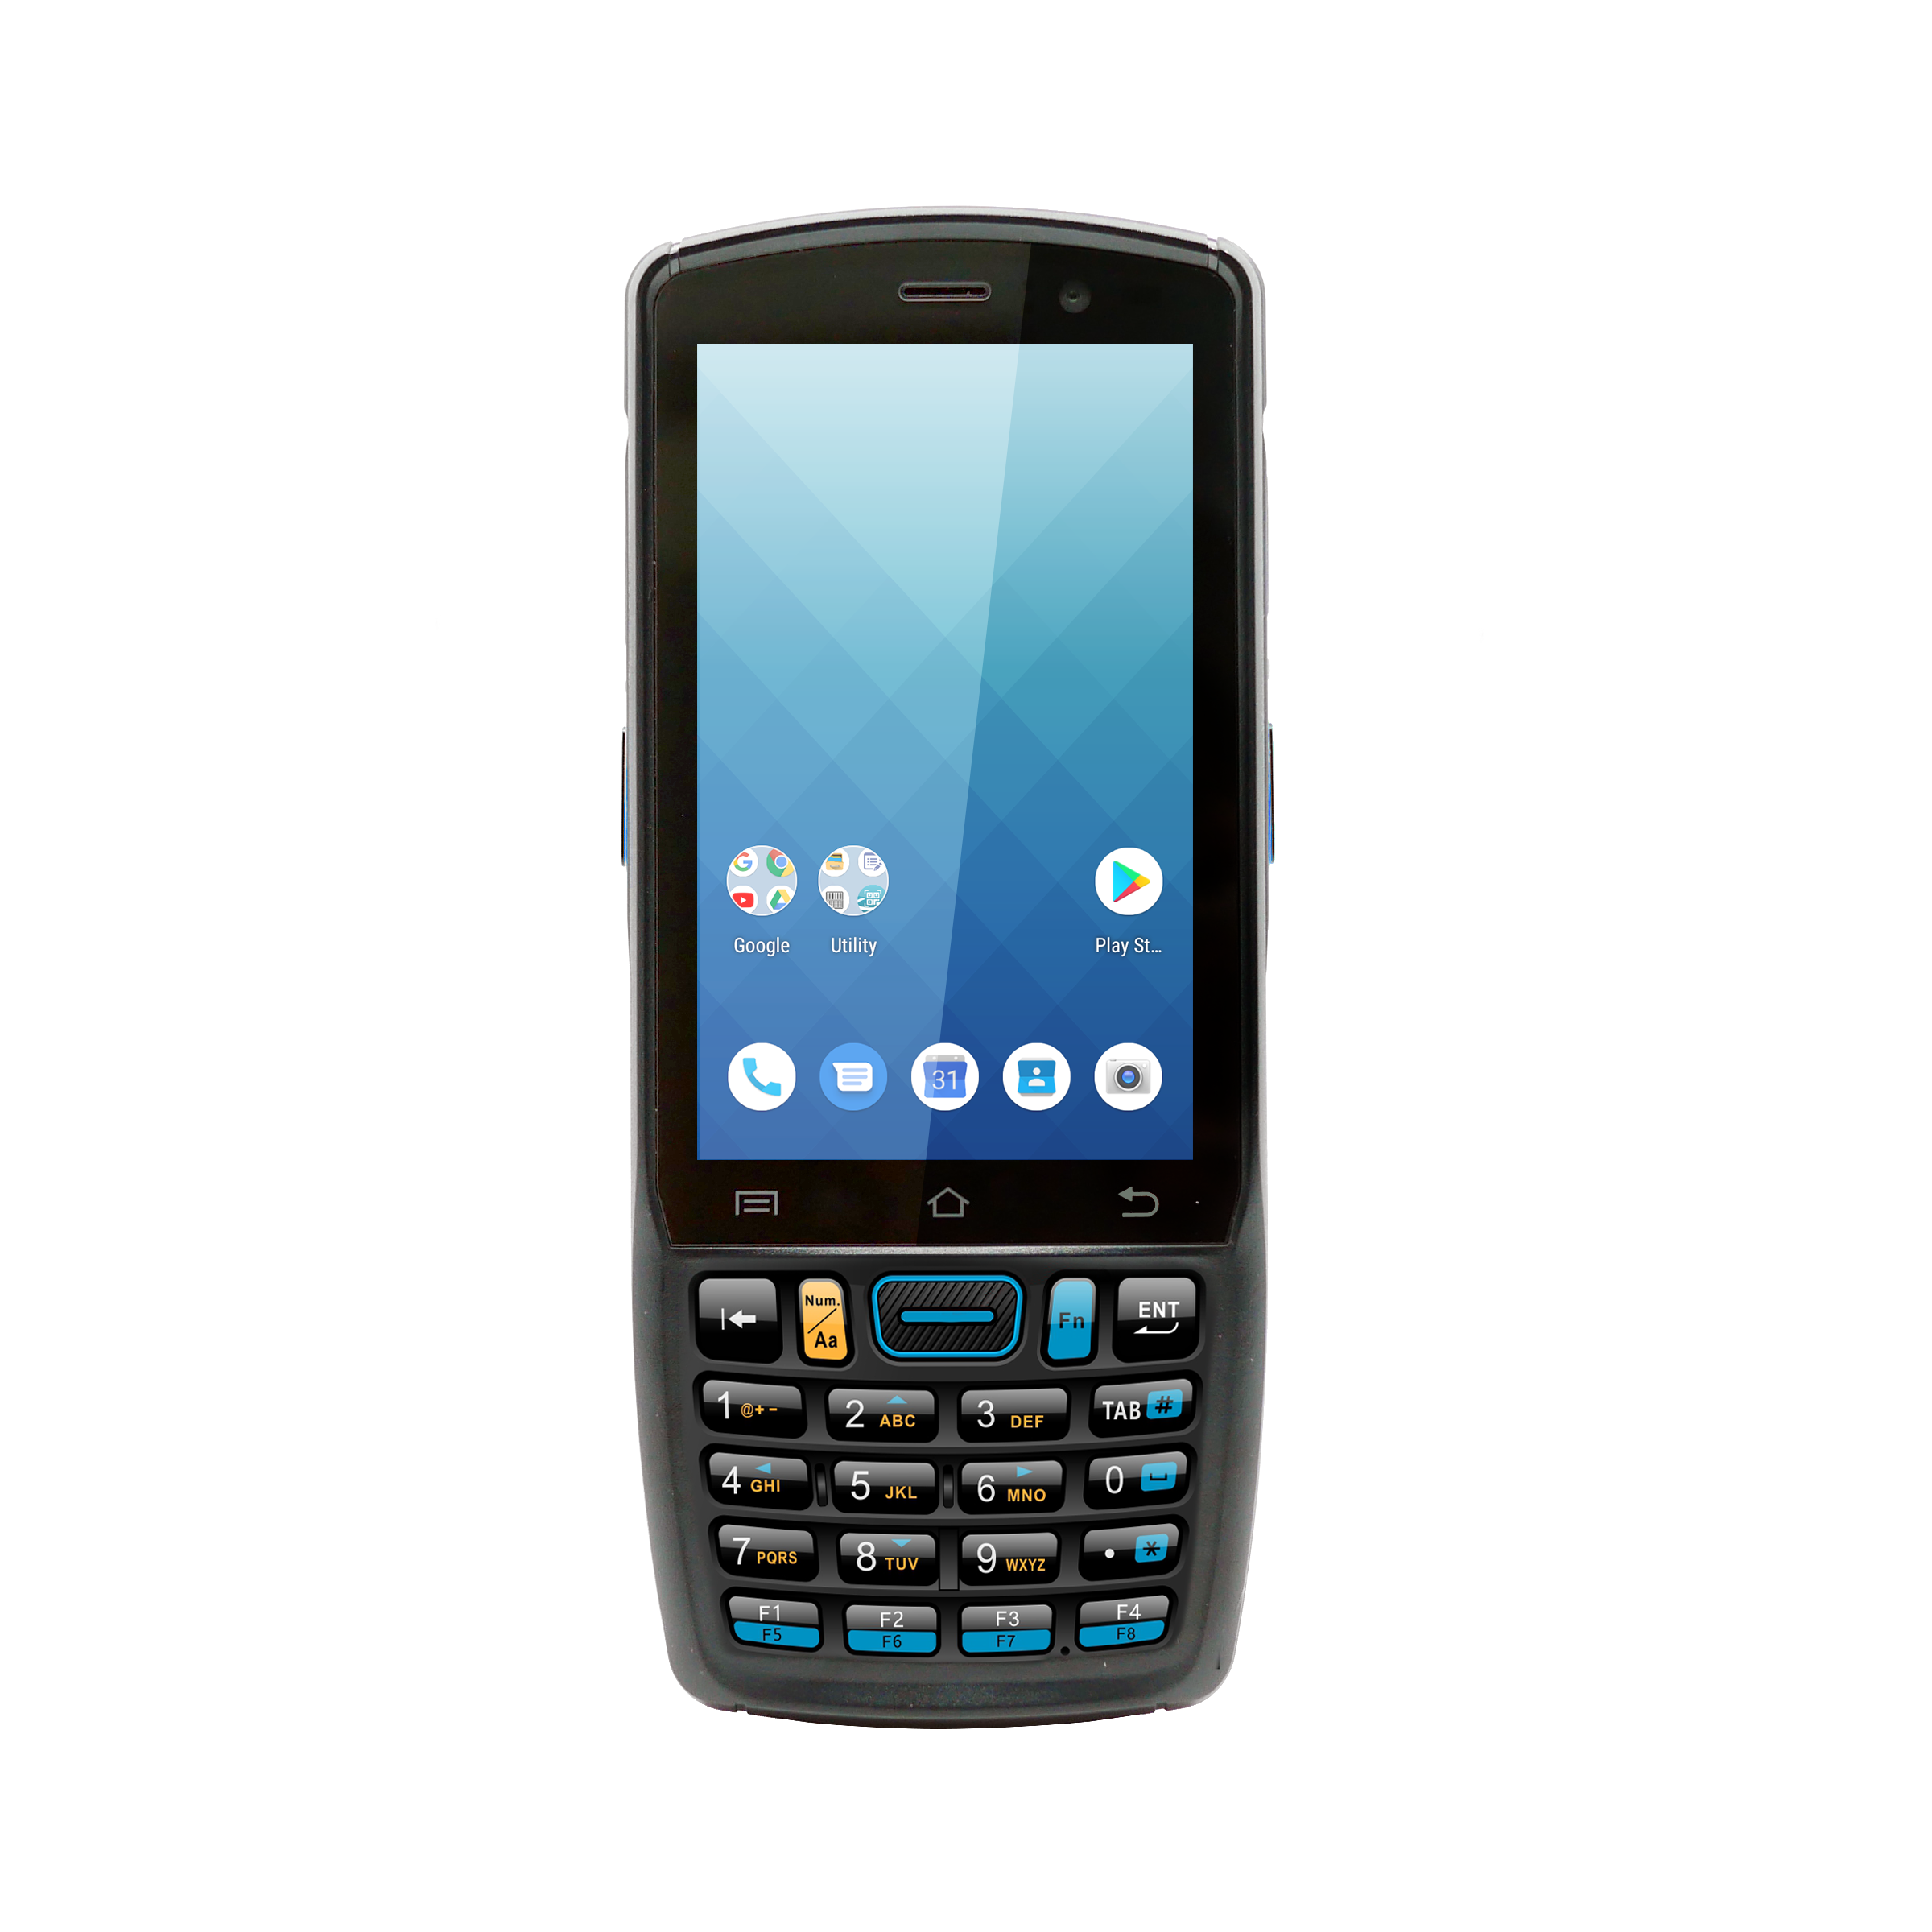 Products Enterprise Tablets Handheld